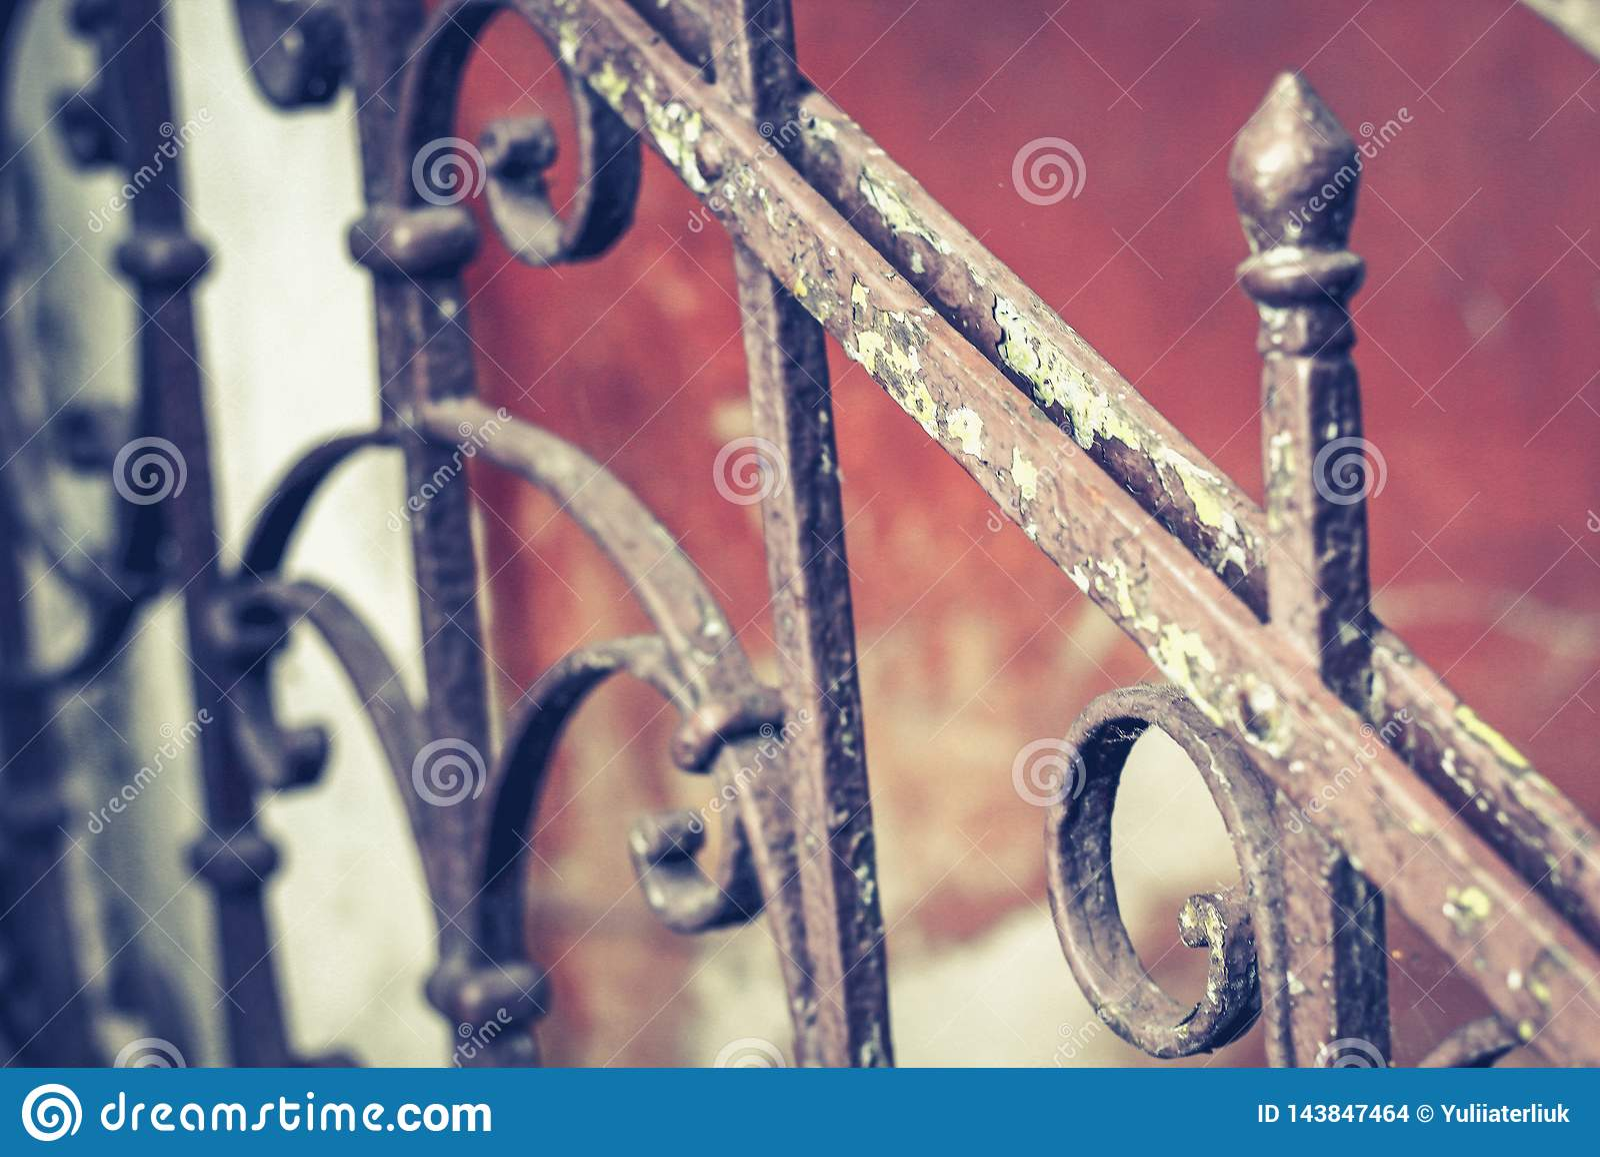 Oud uitstekend traliewerk met roest op de treden in het huis Gesmede omheinende stappen in het huis